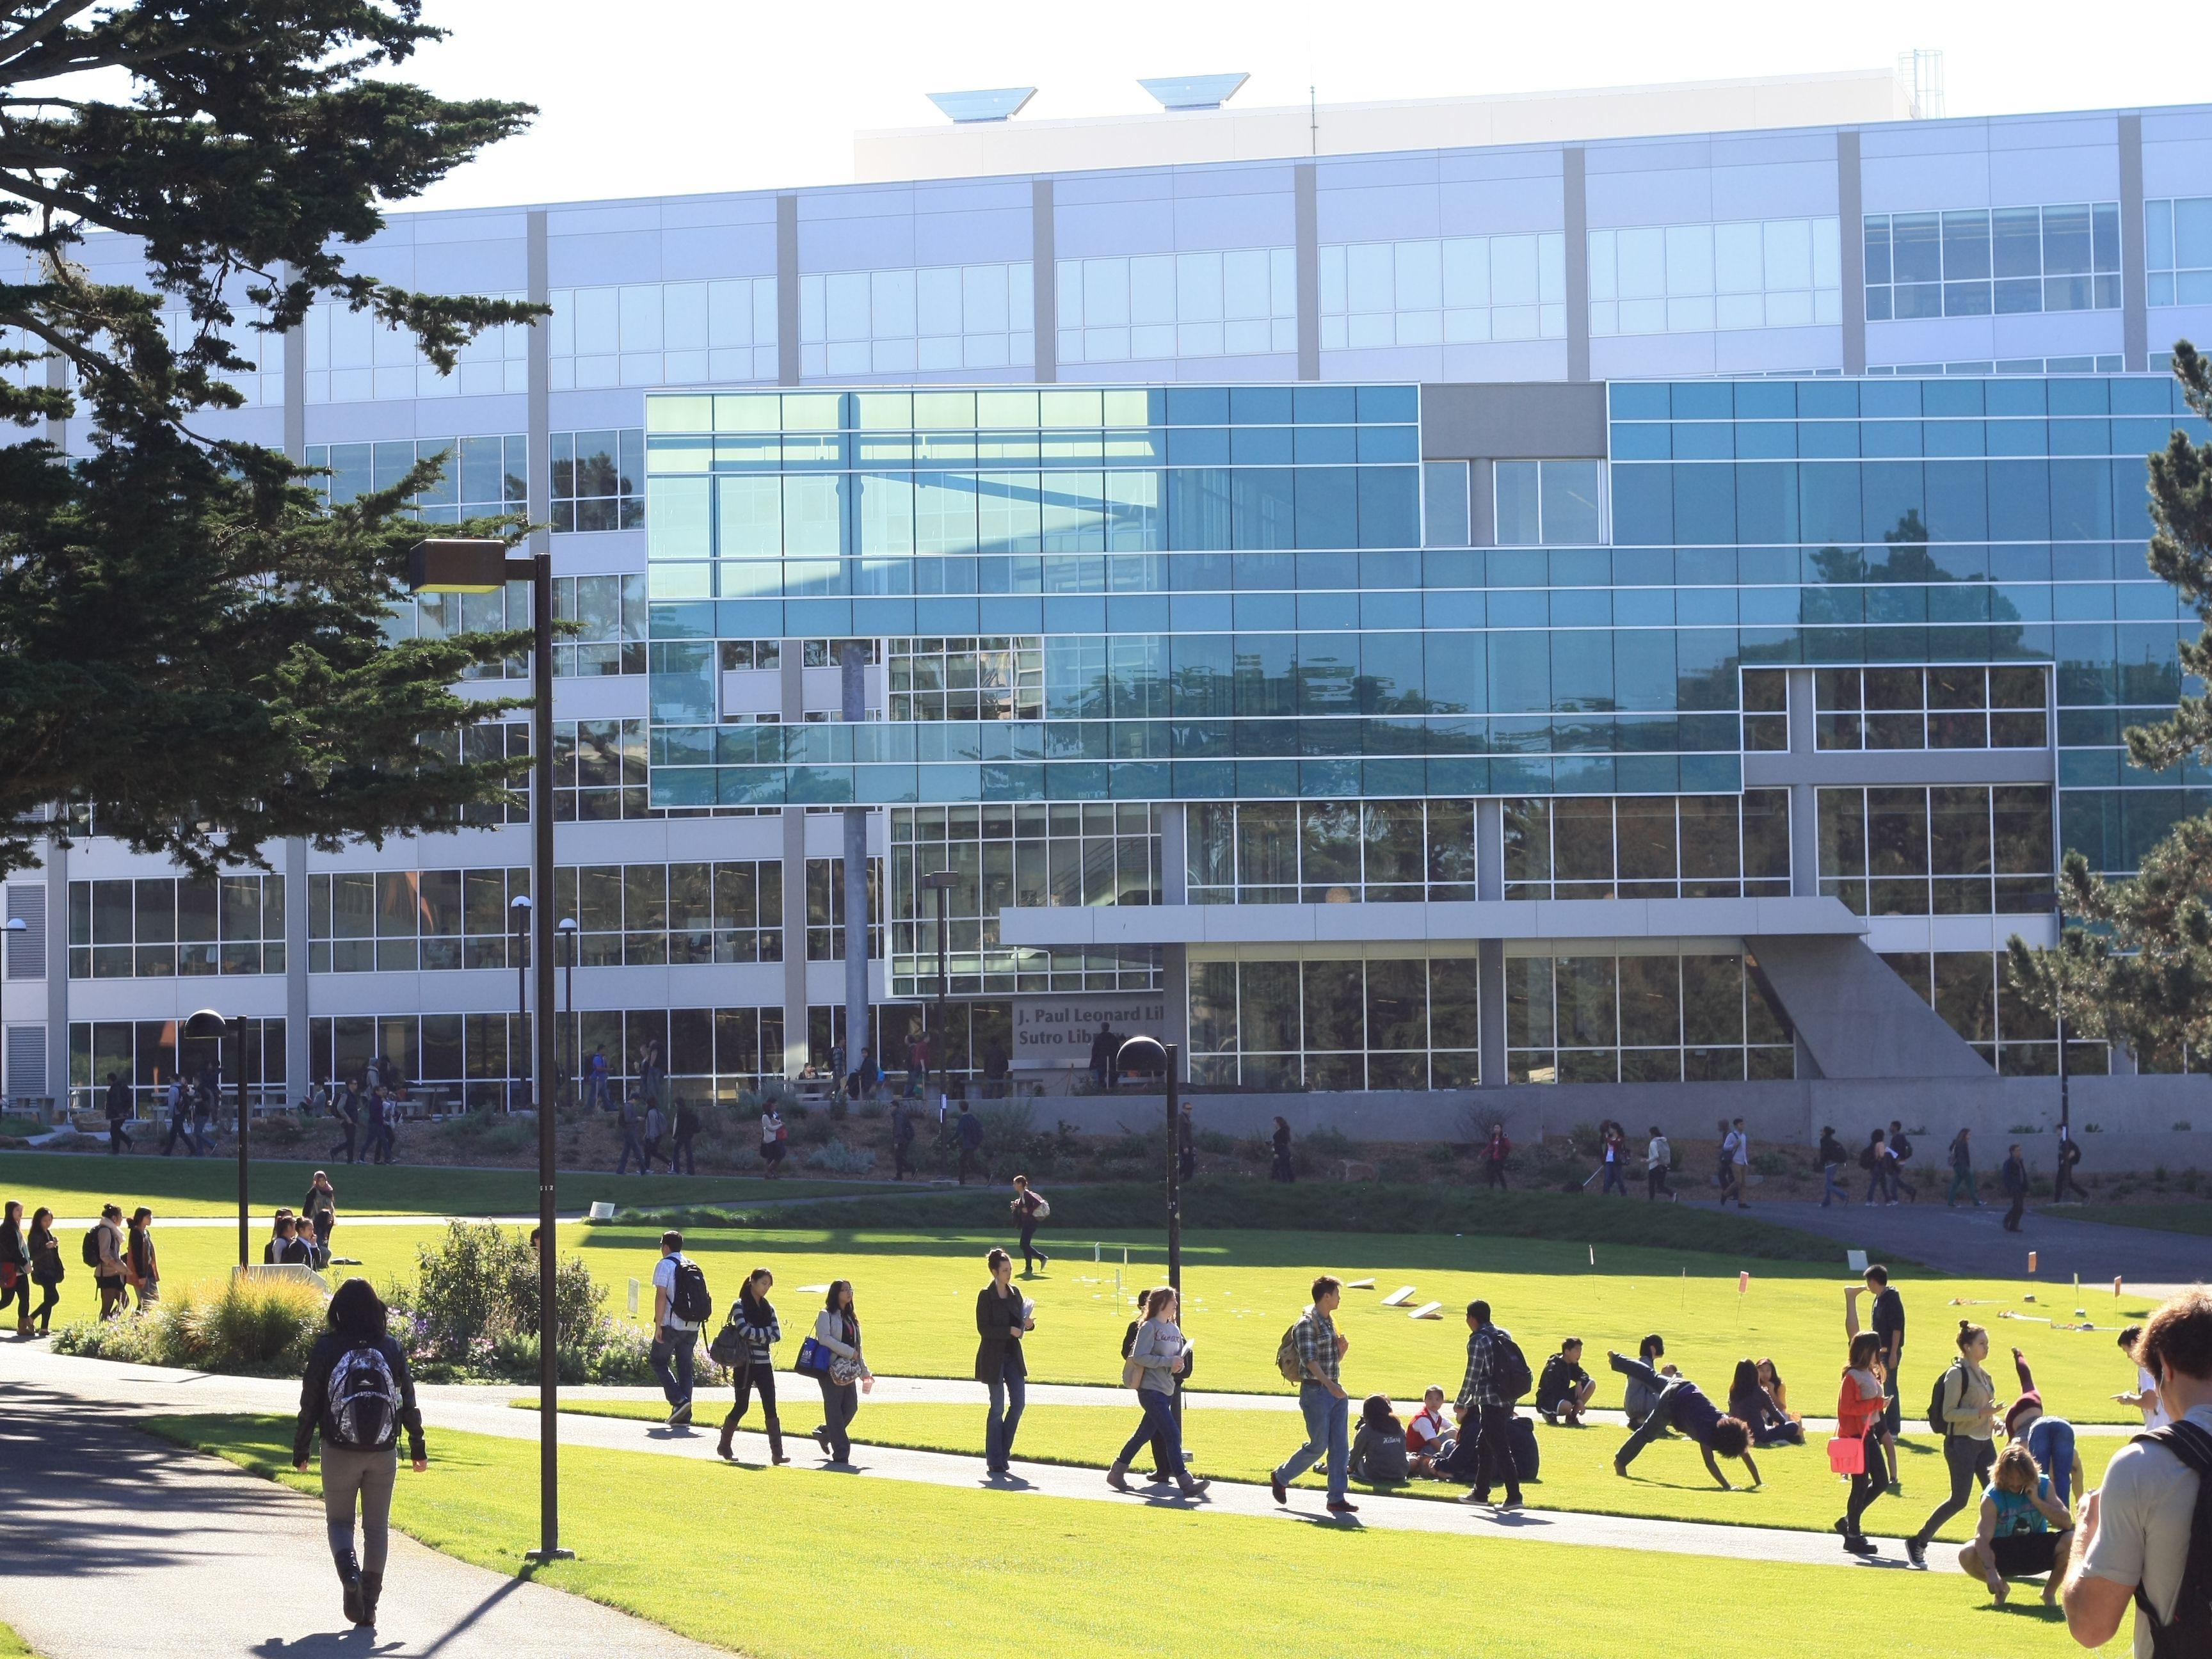 San Francisco State University: Acceptance Rate, SAT/ACT Scores, GPA